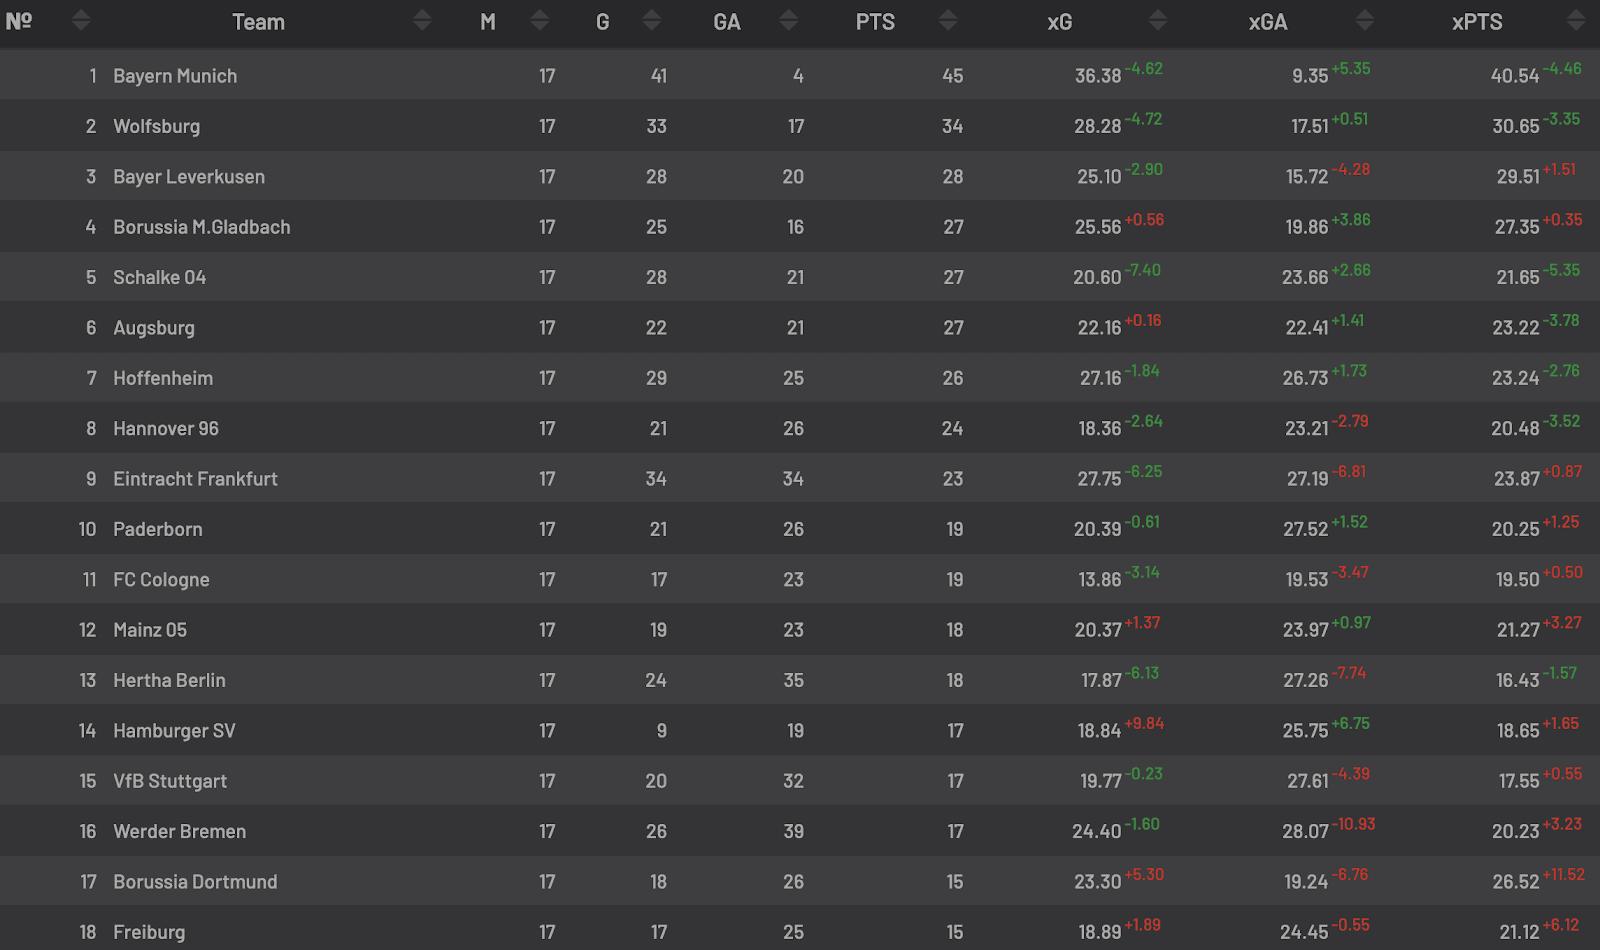 Bundesliga Hinrunden Tabelle 2014/2015 mit Expected Goals